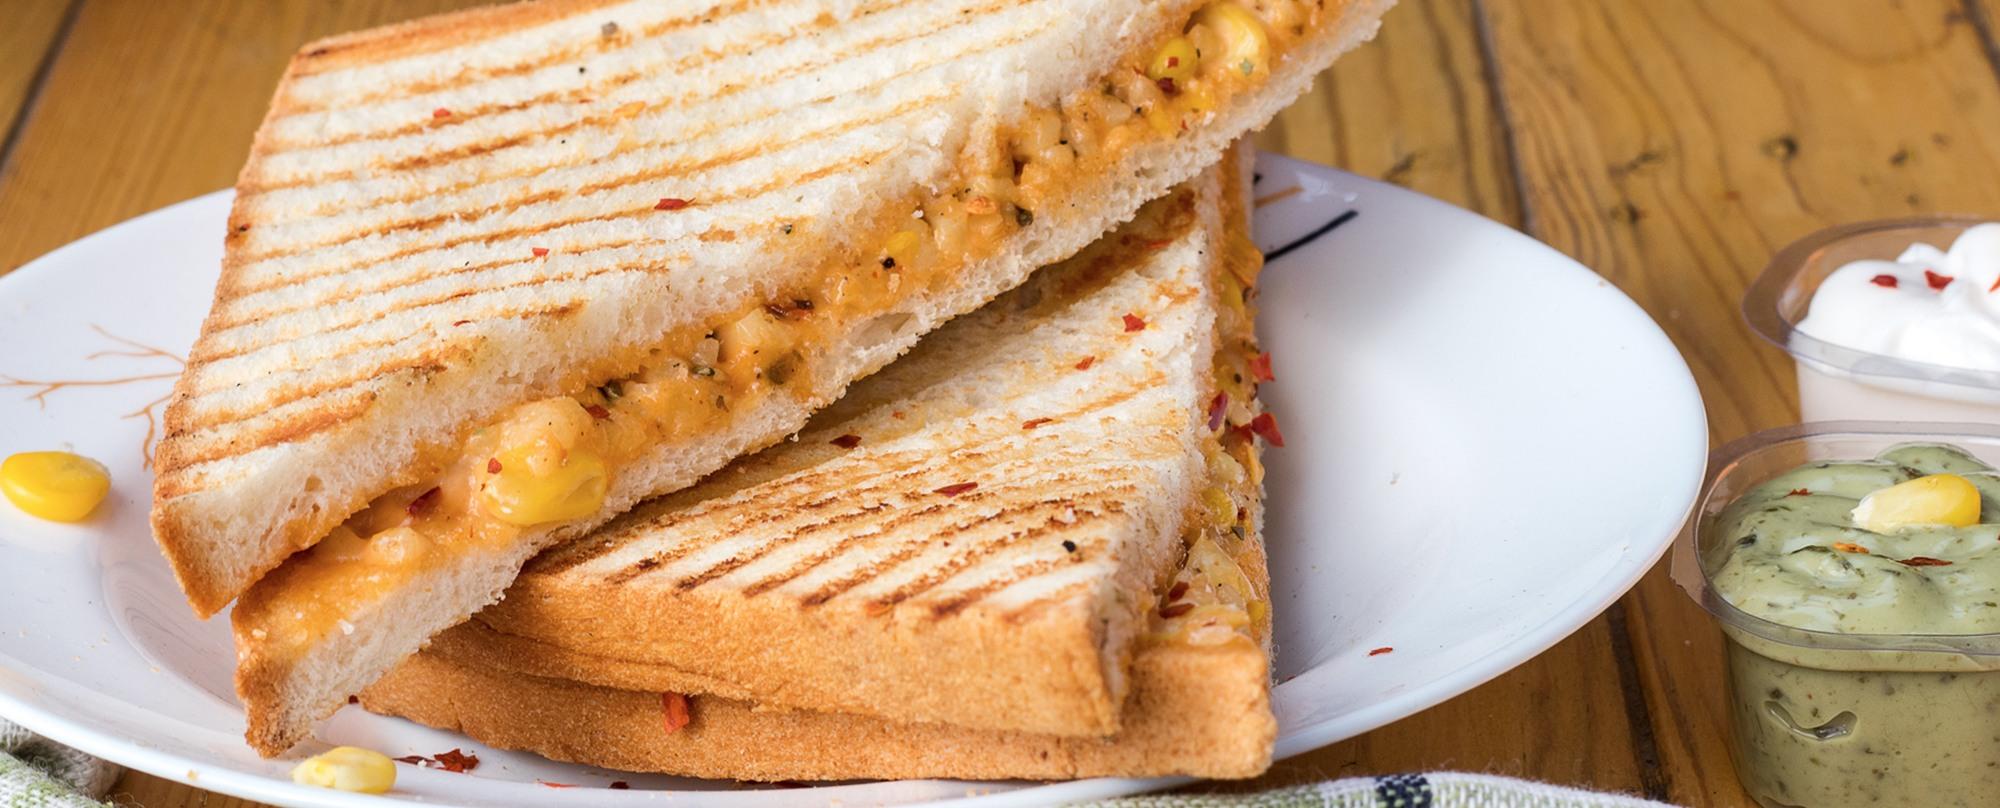 Managing Salon Staff Room Wars: Who Ate My Sandwich?